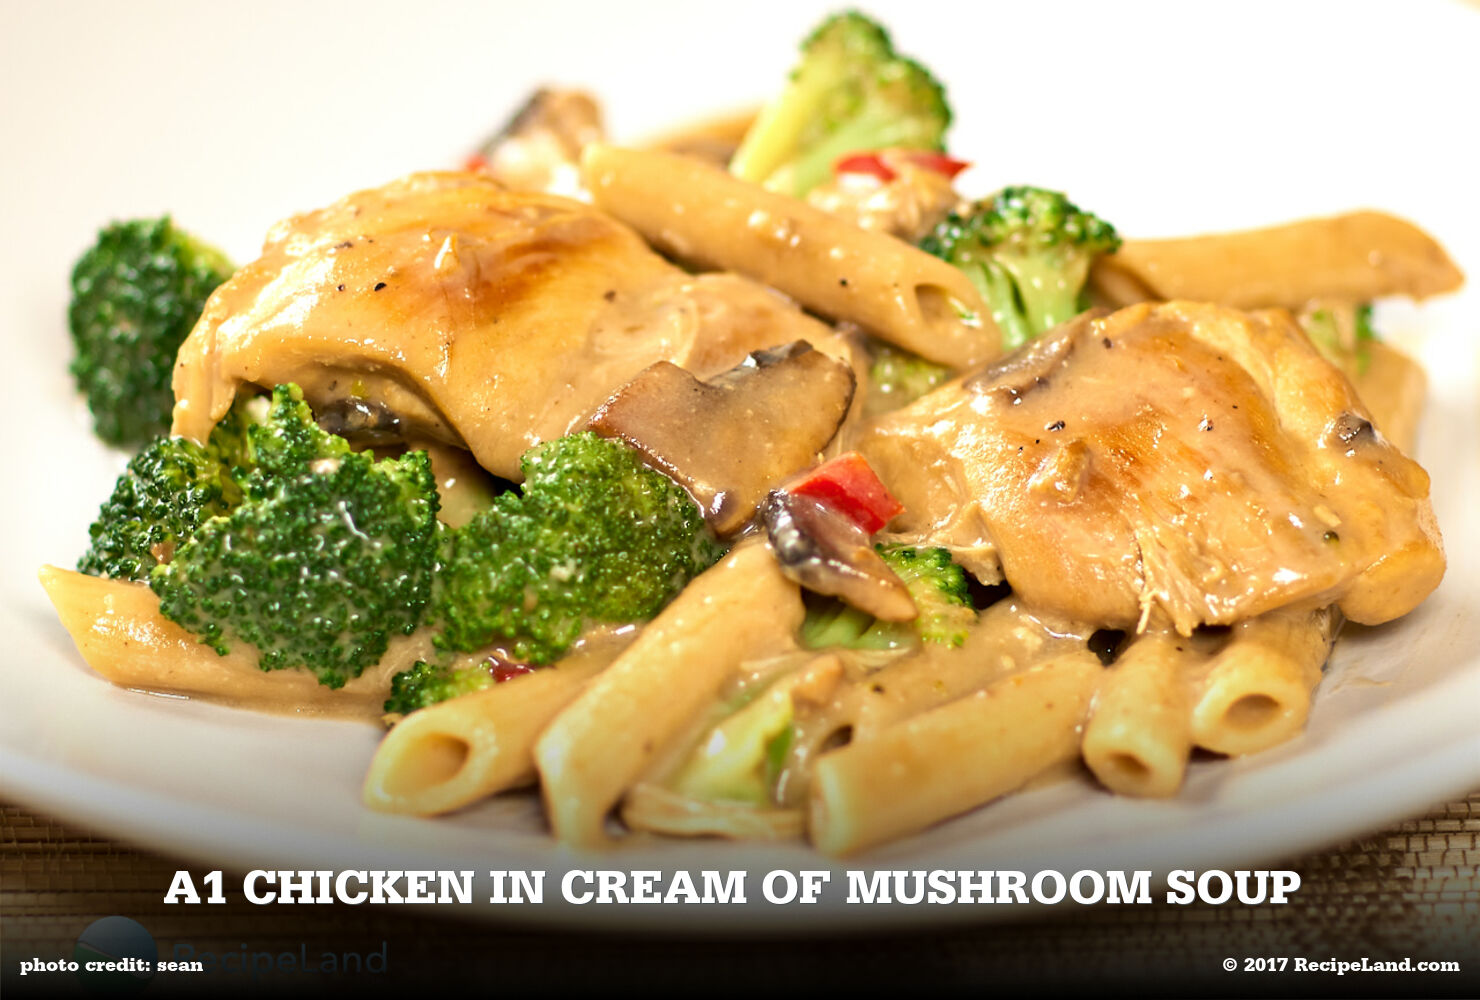 A1 Chicken in Cream of Mushroom Soup